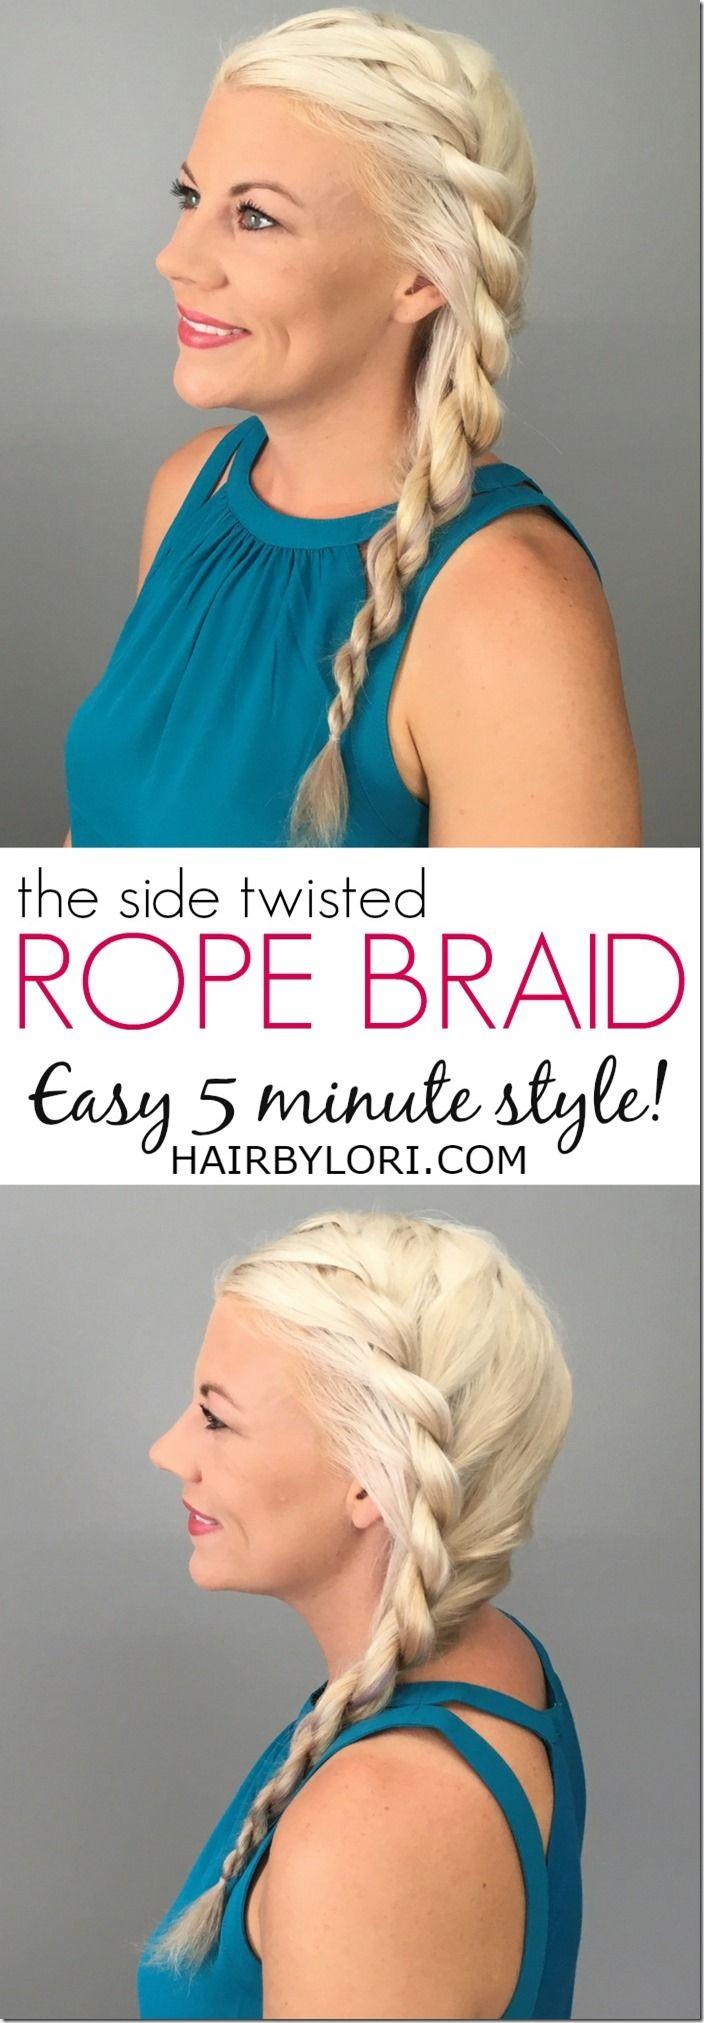 Easy Side Rope Braid